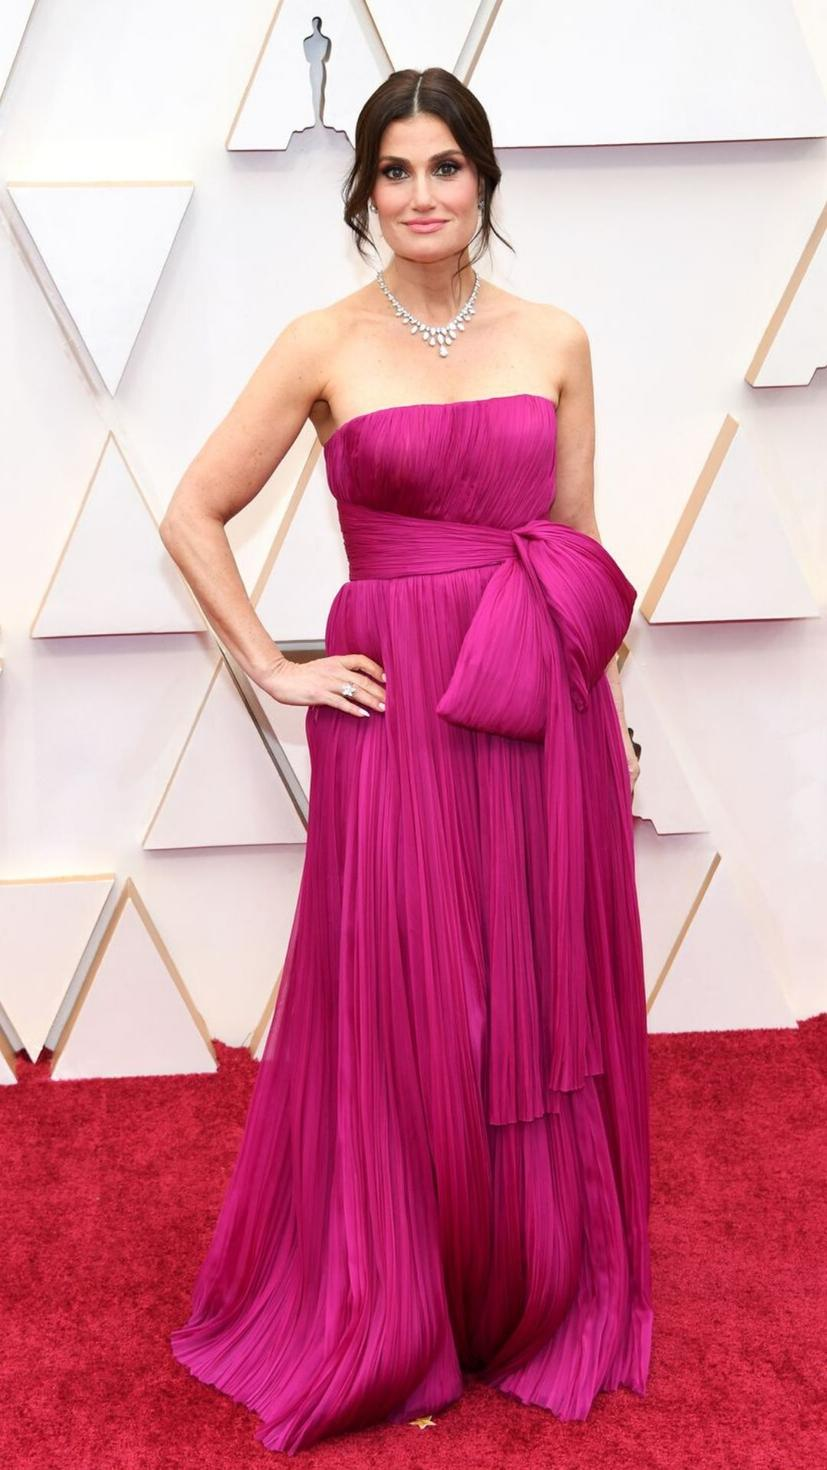 Idina Menzel wears a dress from J. Mendel and jewellery from Harry Winston